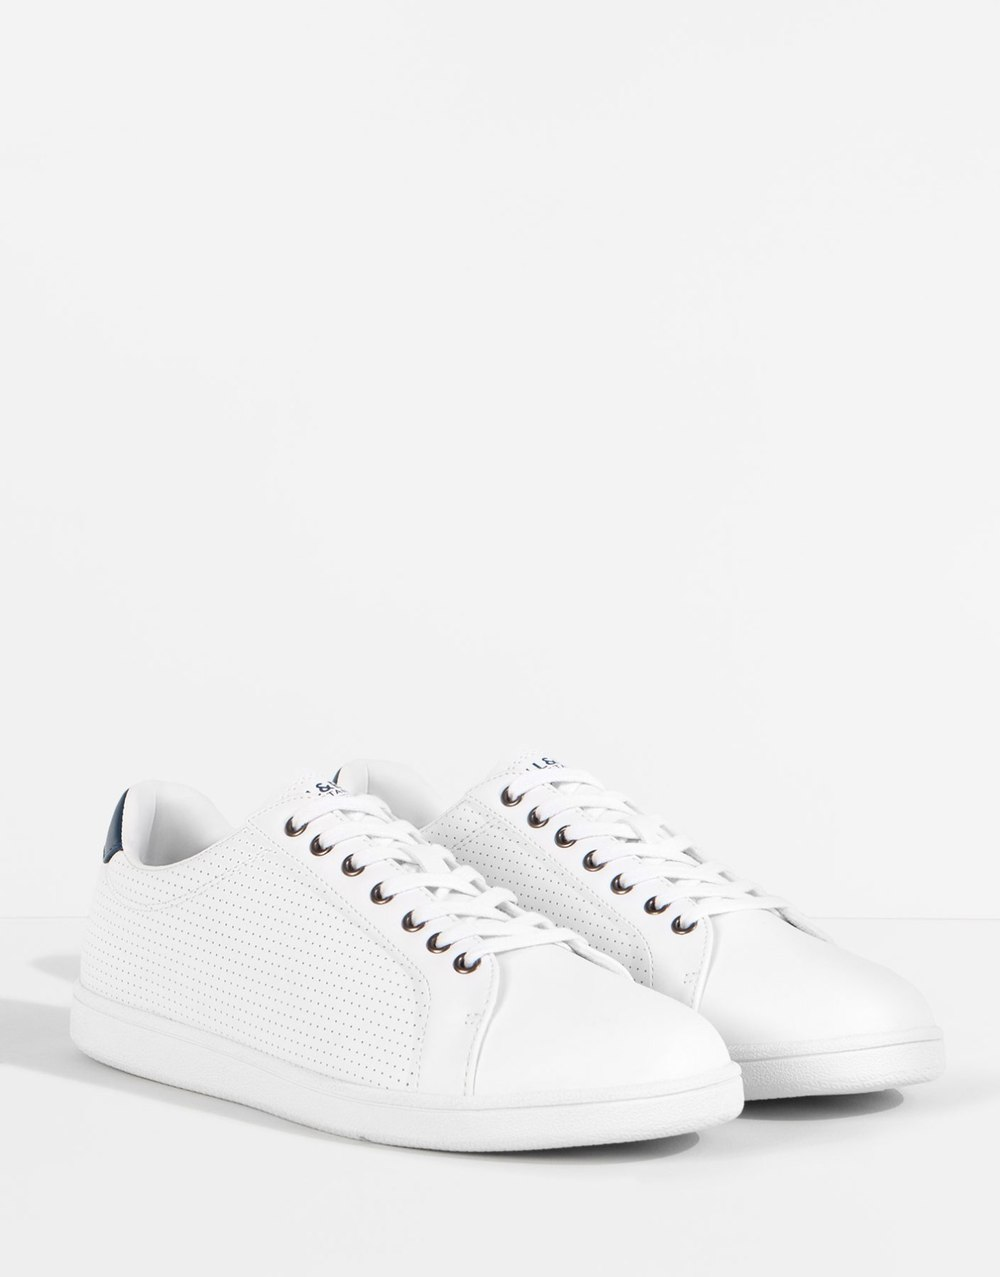 Punched formalwear plimsolls, £29.99 ( pullandbear.com )